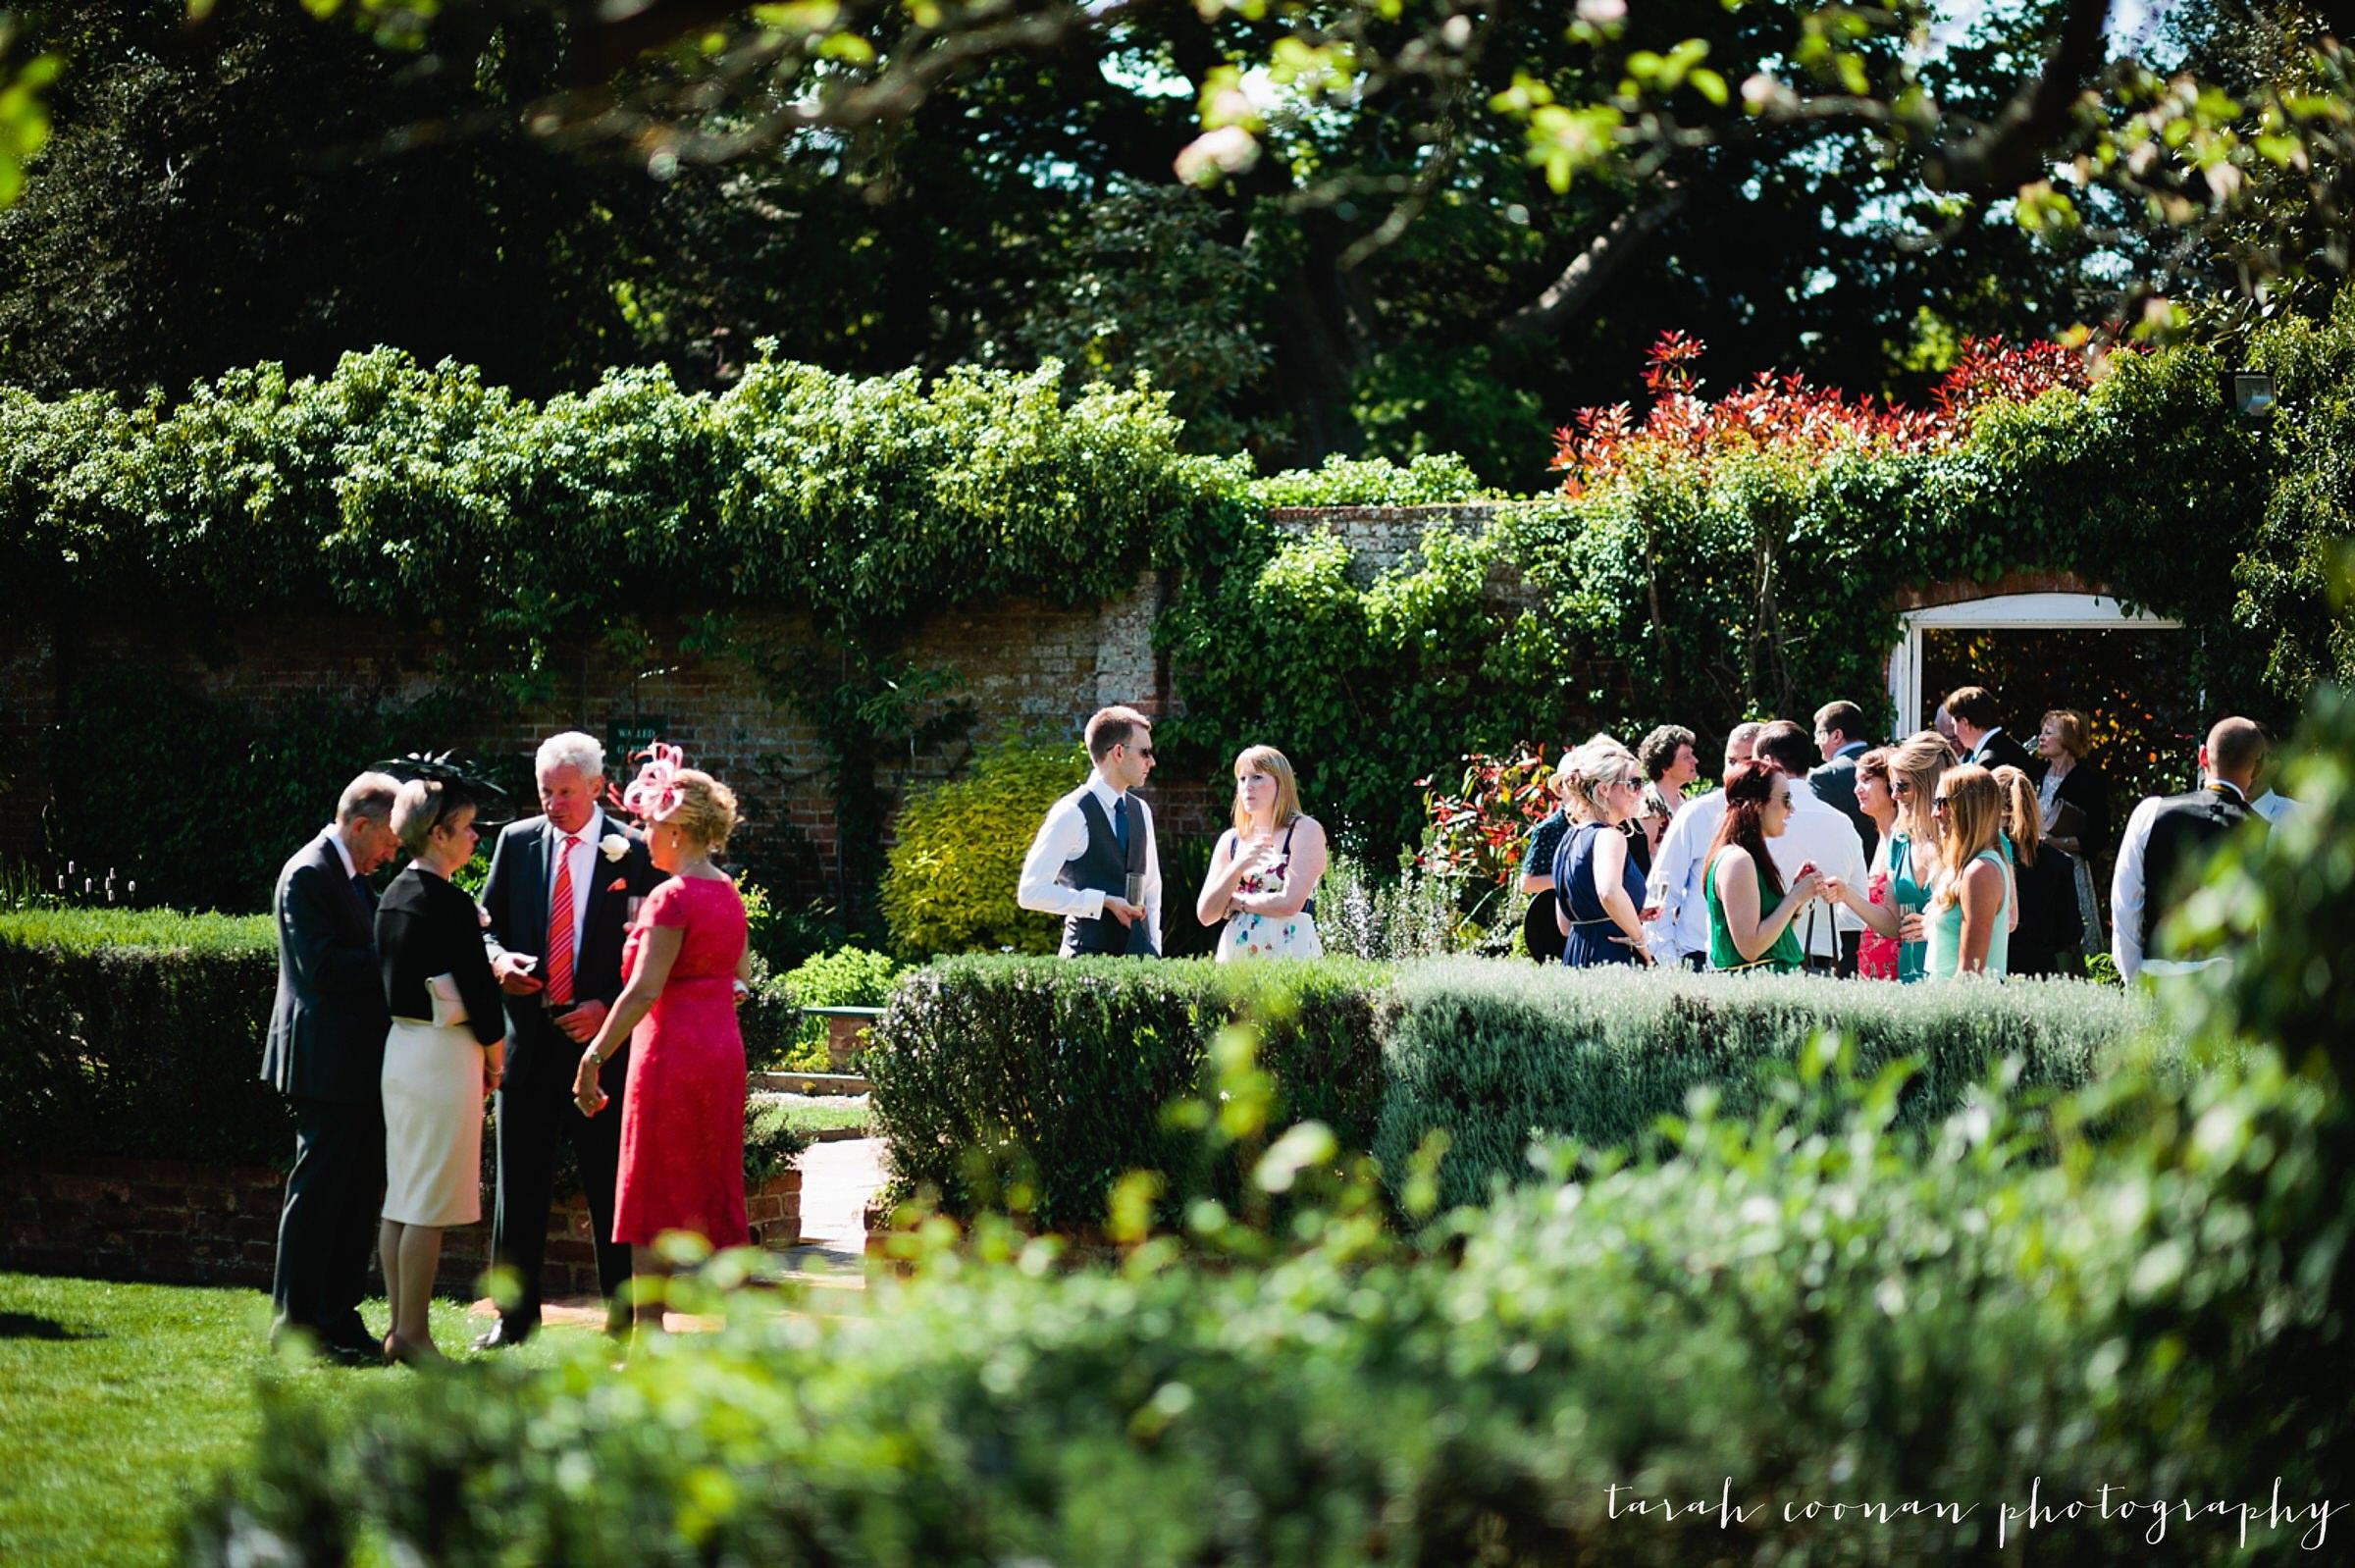 northbrook-park-wedding-photographer_057